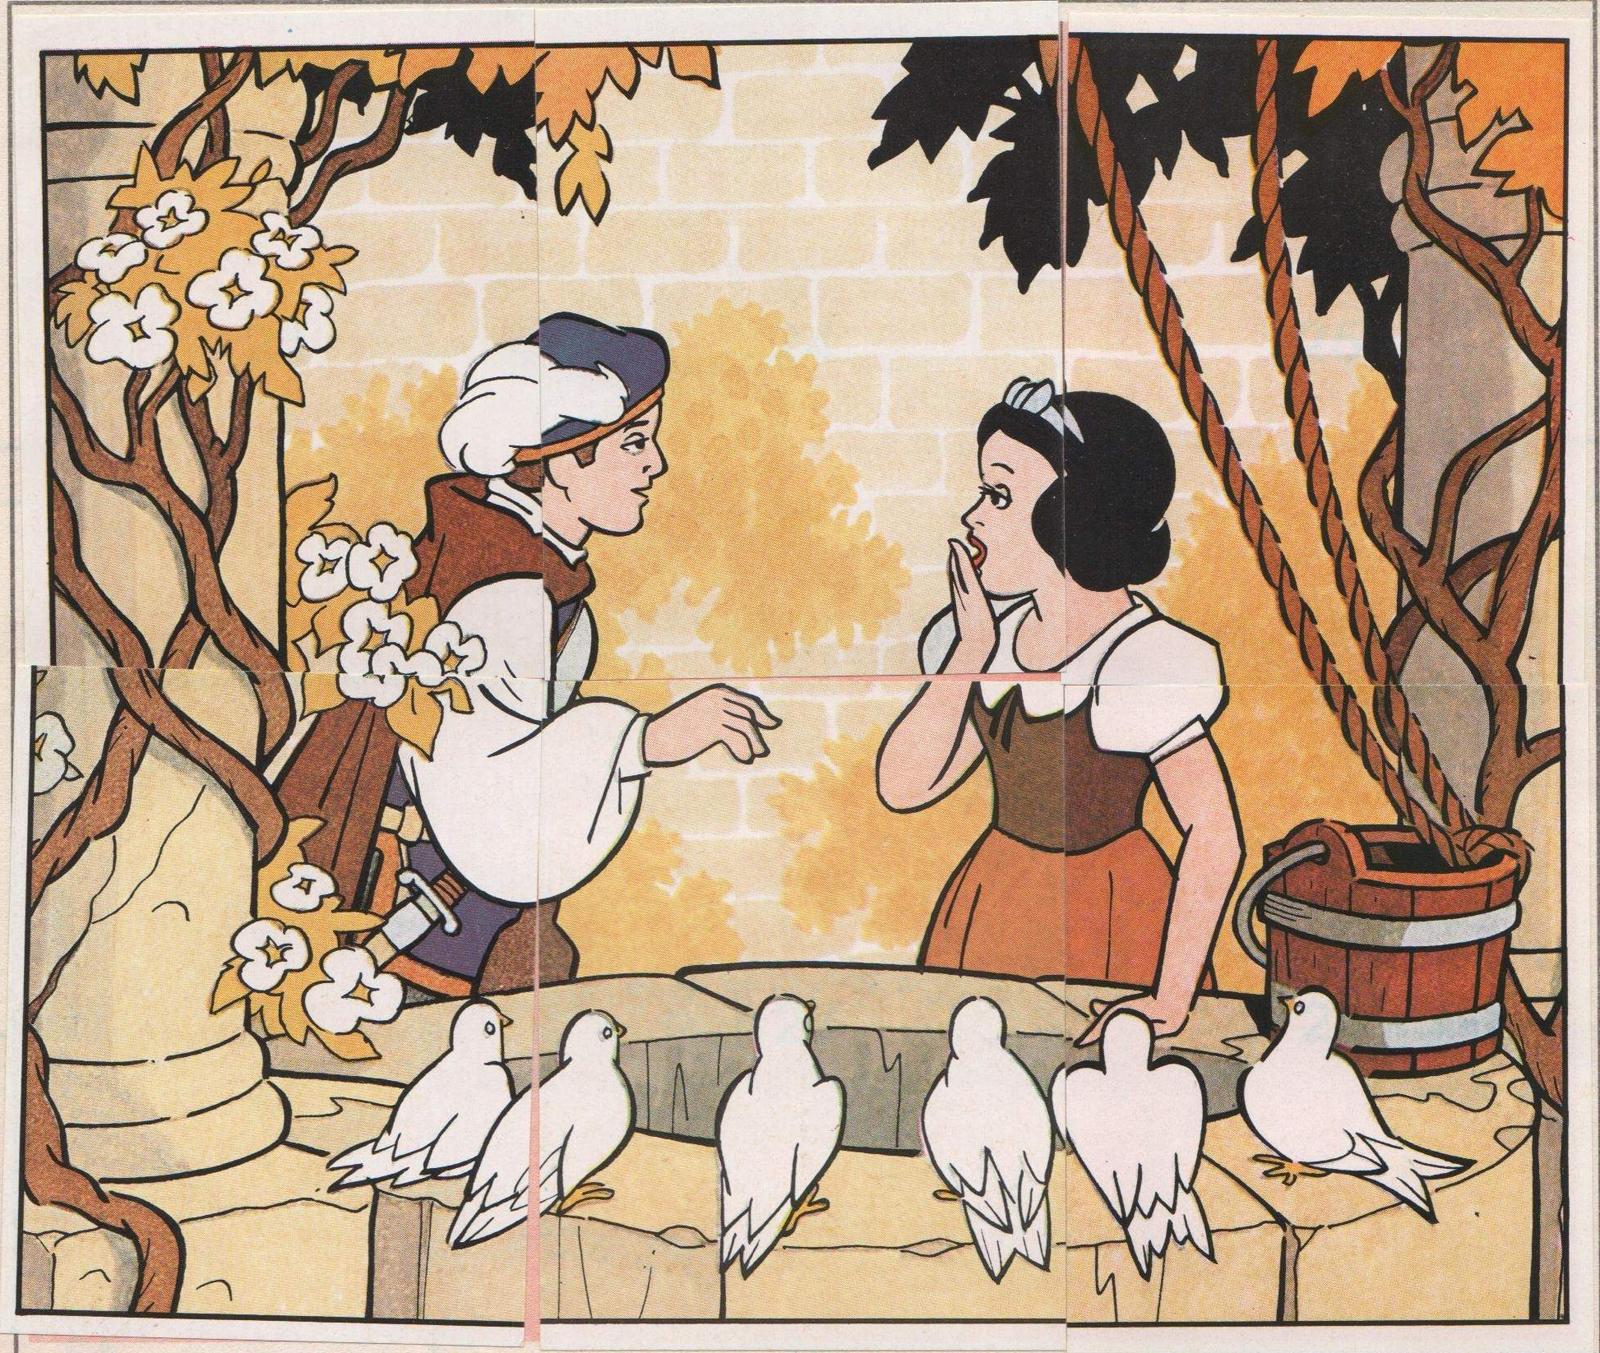 filmic light snow white archive panini snow white stickers nos 77 80 animals lead snow white to cottage